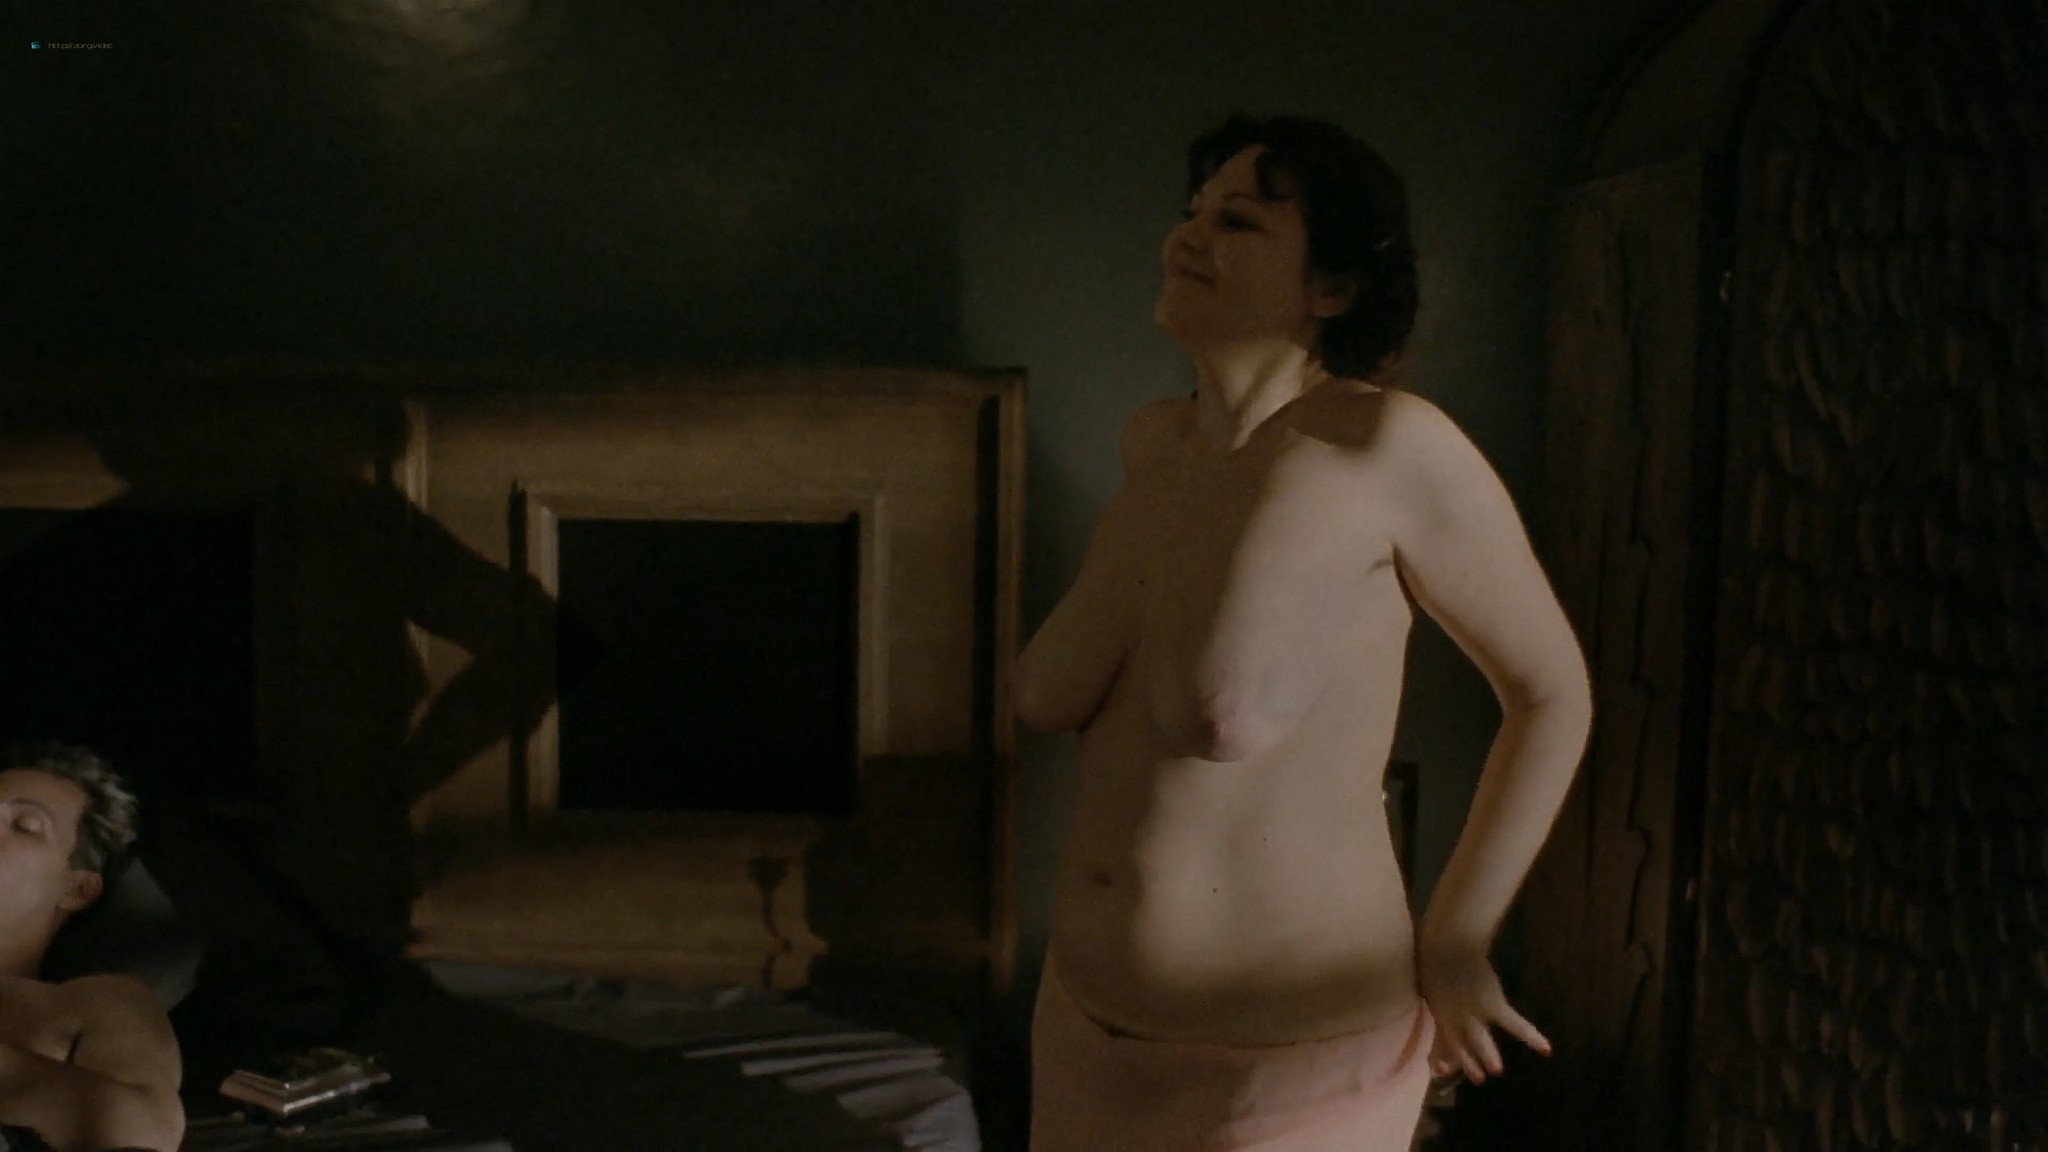 Ekaterina Yuspina nude explicit sex Tatyana Polozhiy, Radmila Shegoleva nude sex too - DAU Katya Tanya (2020) HD 1080p (19)